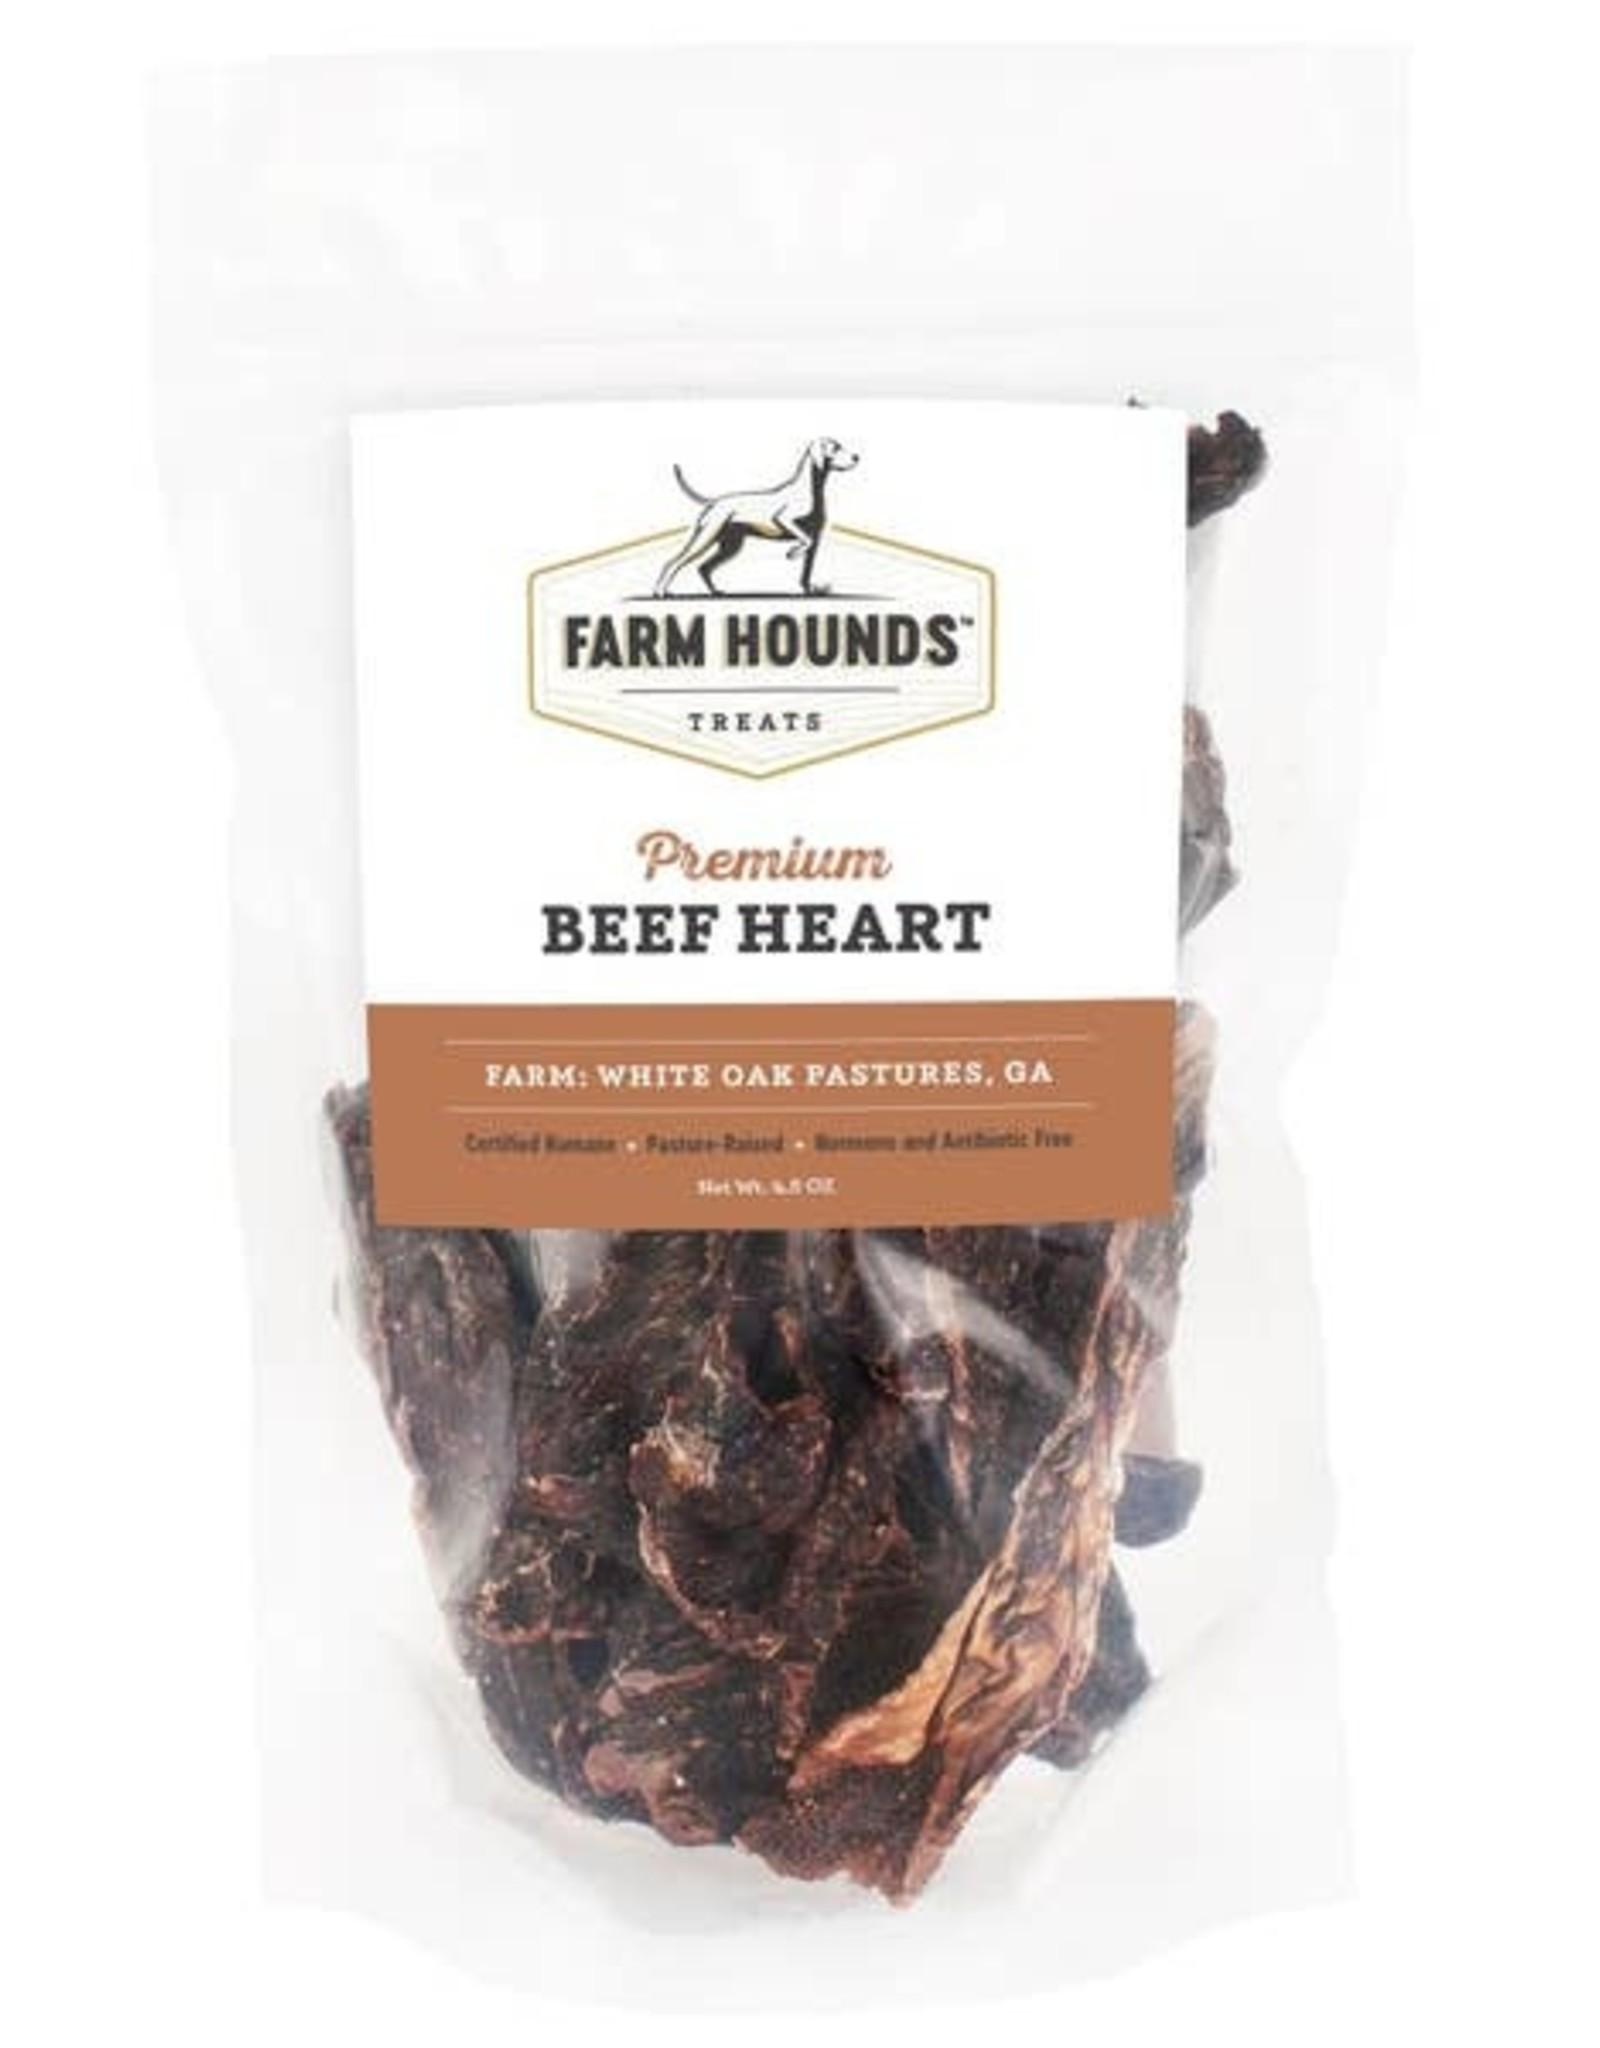 Farm Hounds Beef Heart - 3.5 oz